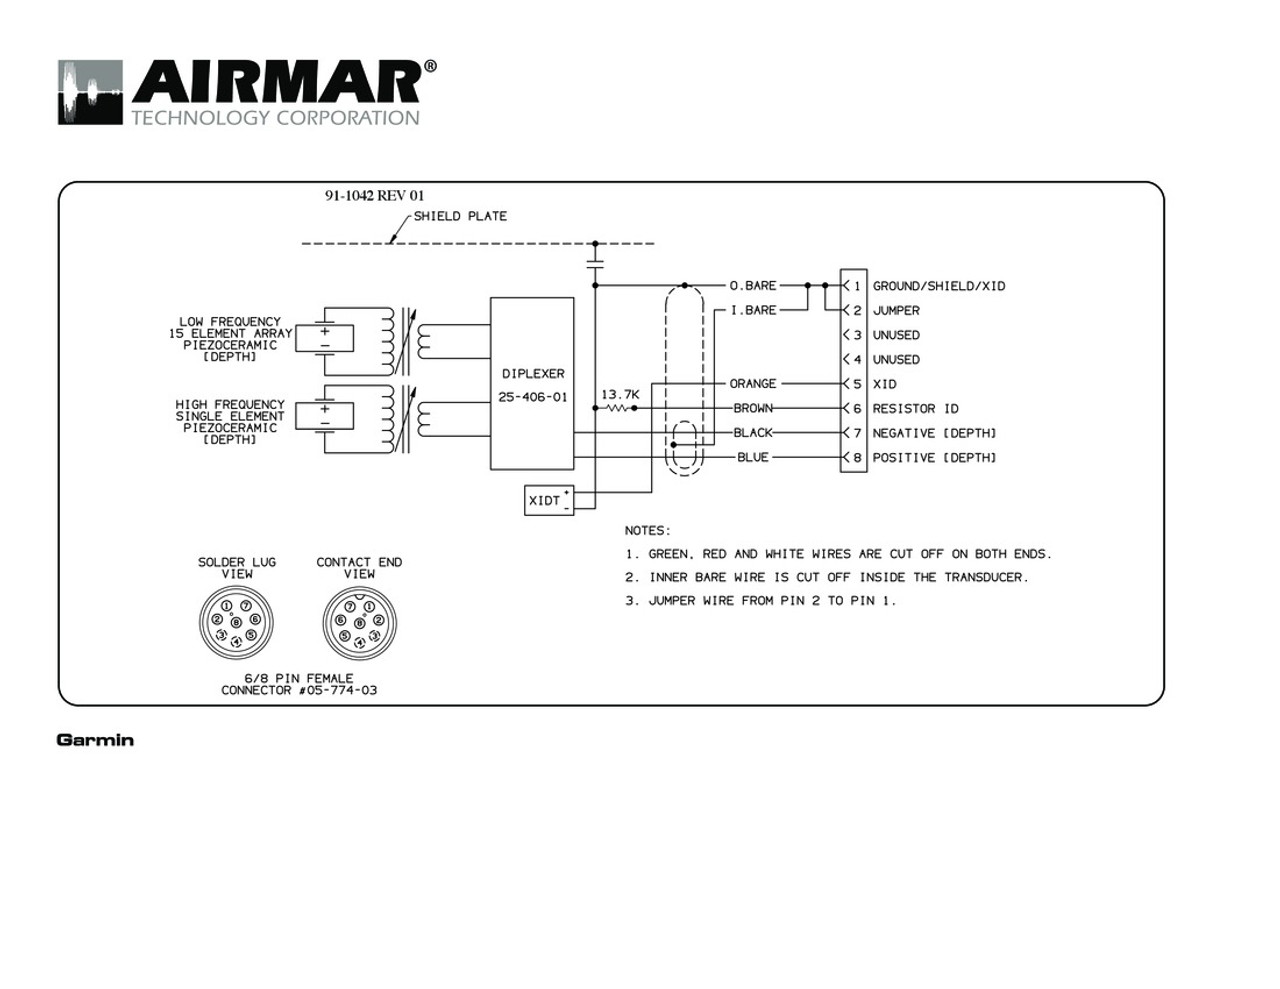 garmin garmin marine wiring diagrams on garmin network cable wiring garmin 3010c wiring garmin speedometer  [ 1100 x 850 Pixel ]